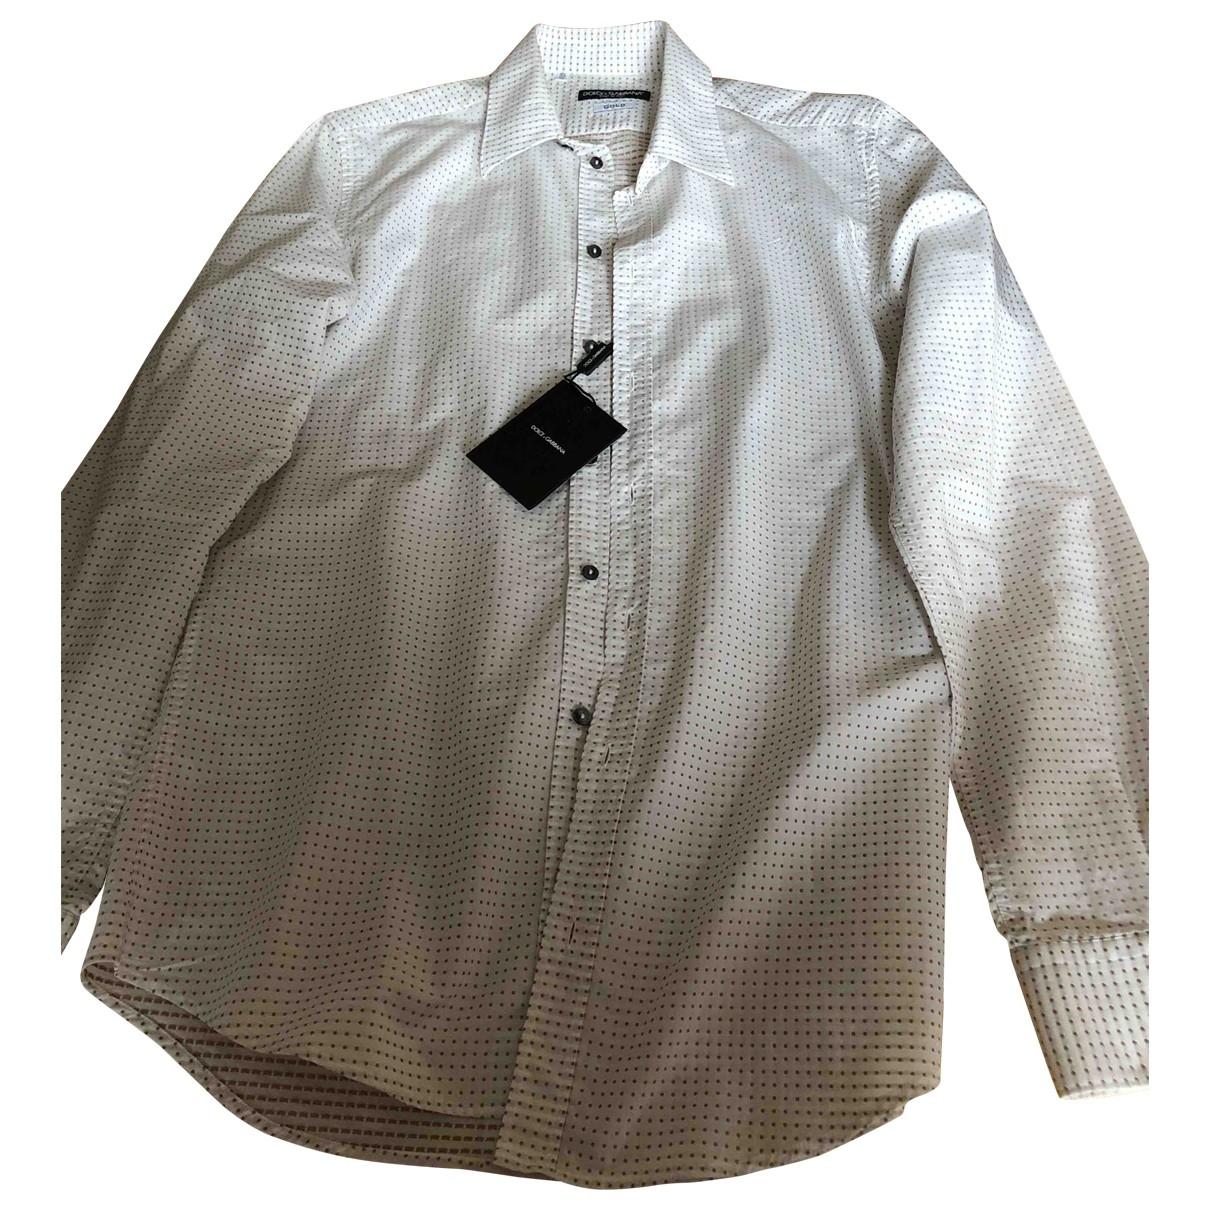 Dolce & Gabbana \N White Cotton Shirts for Men 40 EU (tour de cou / collar)